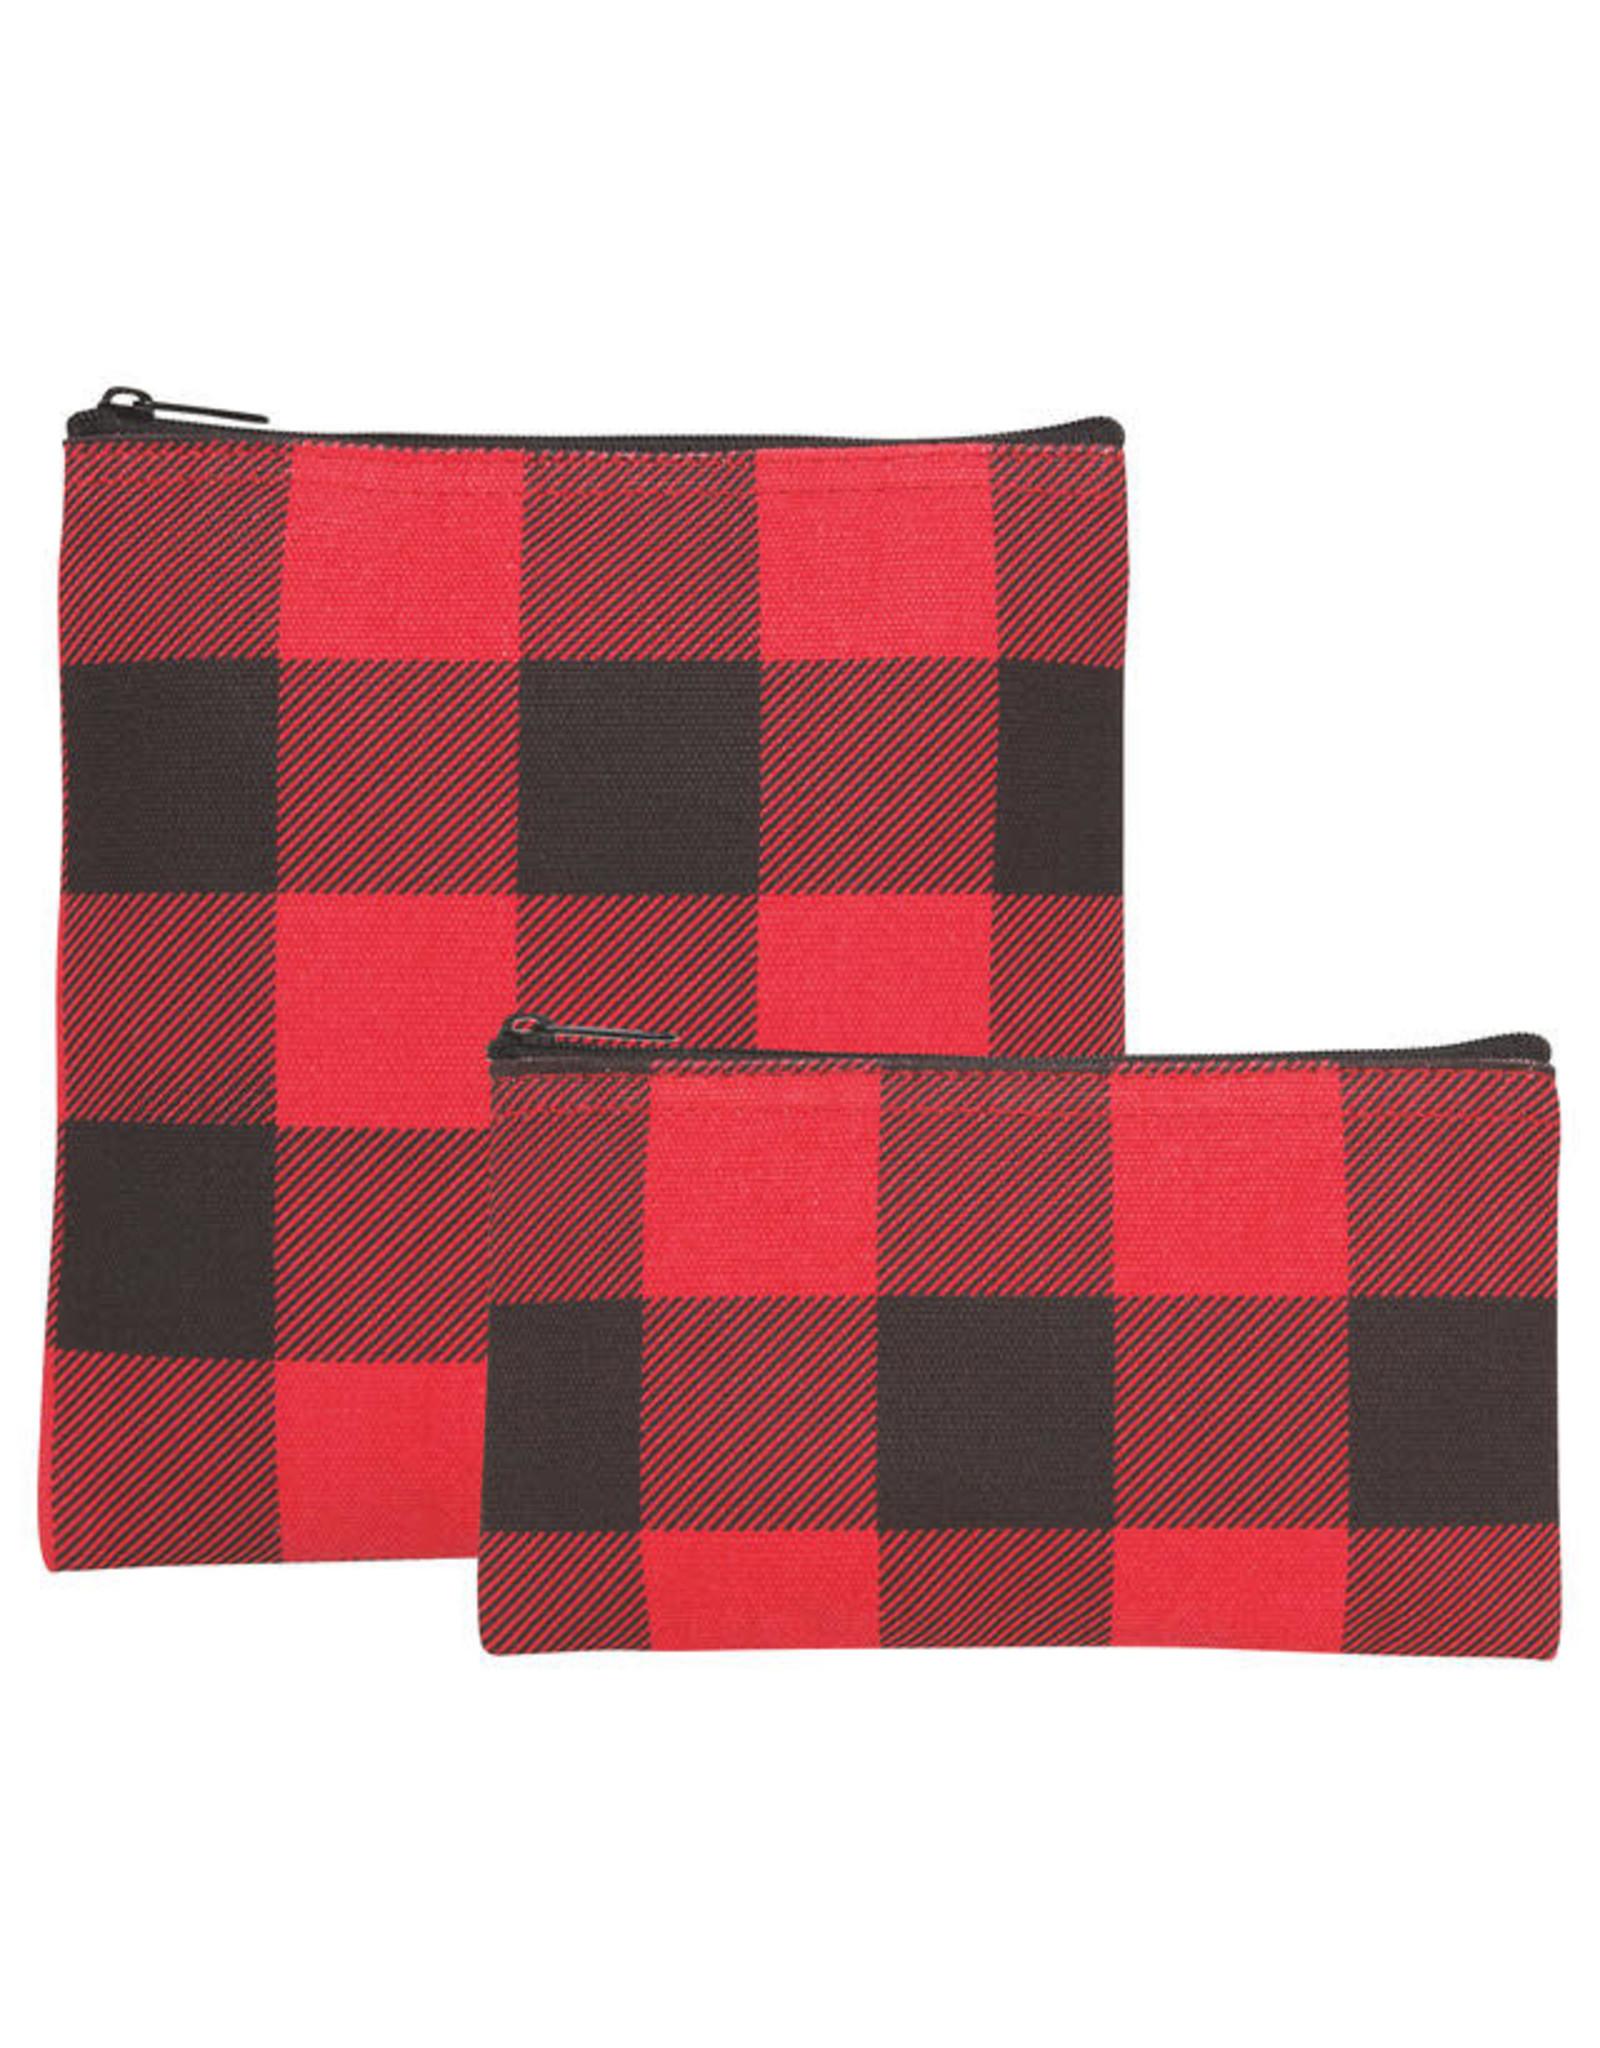 Buffalo Check Snack Bags Set of 2